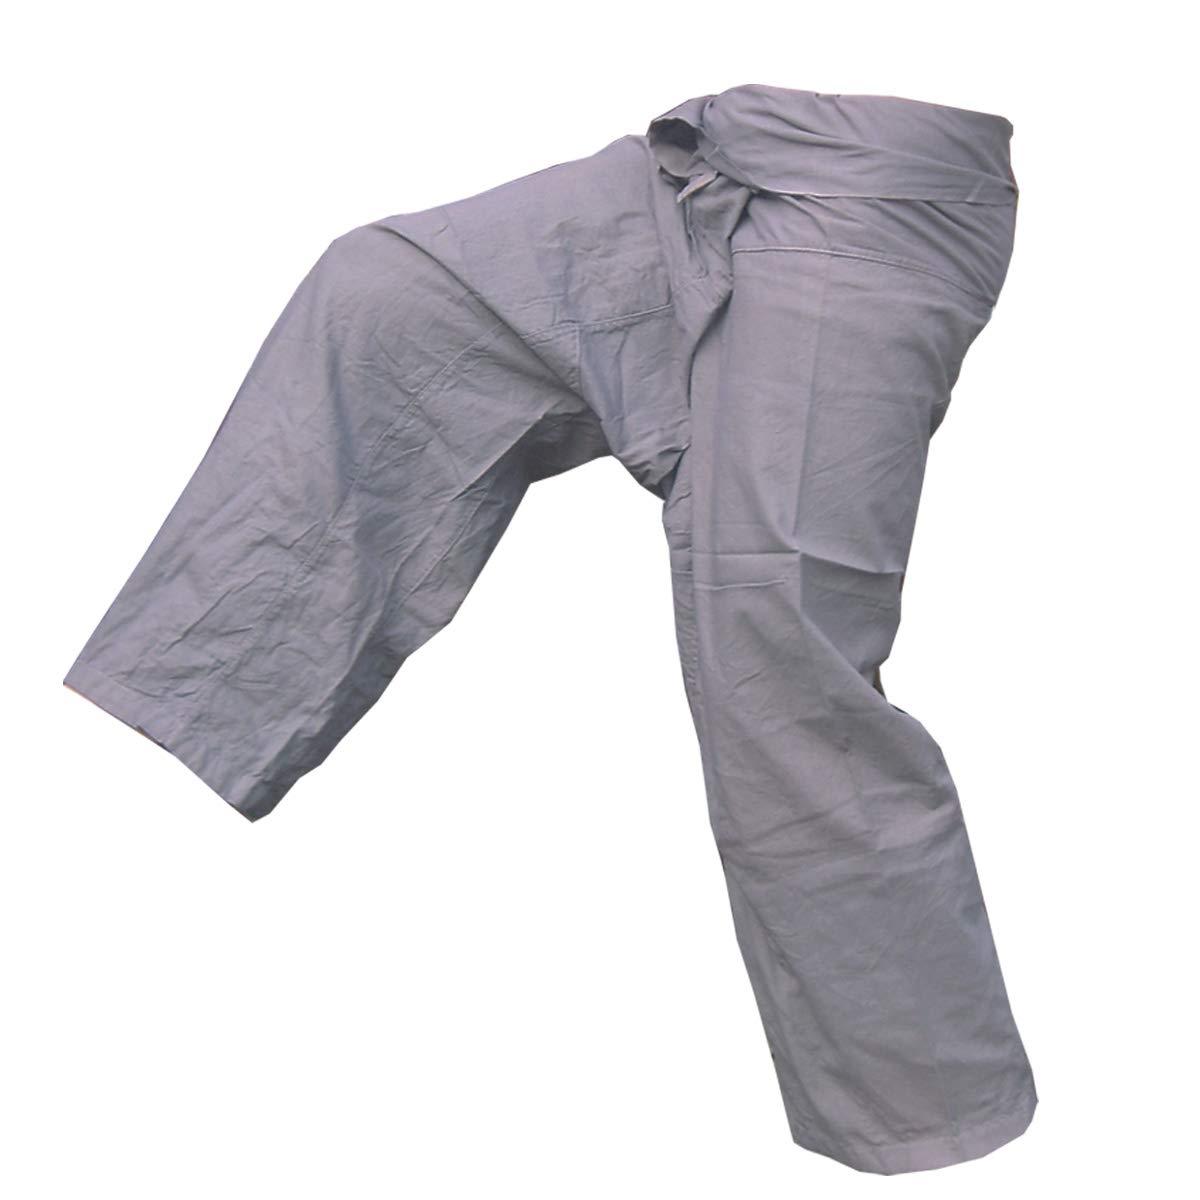 Donna PANASIAM Pantaloni Taglio Largo